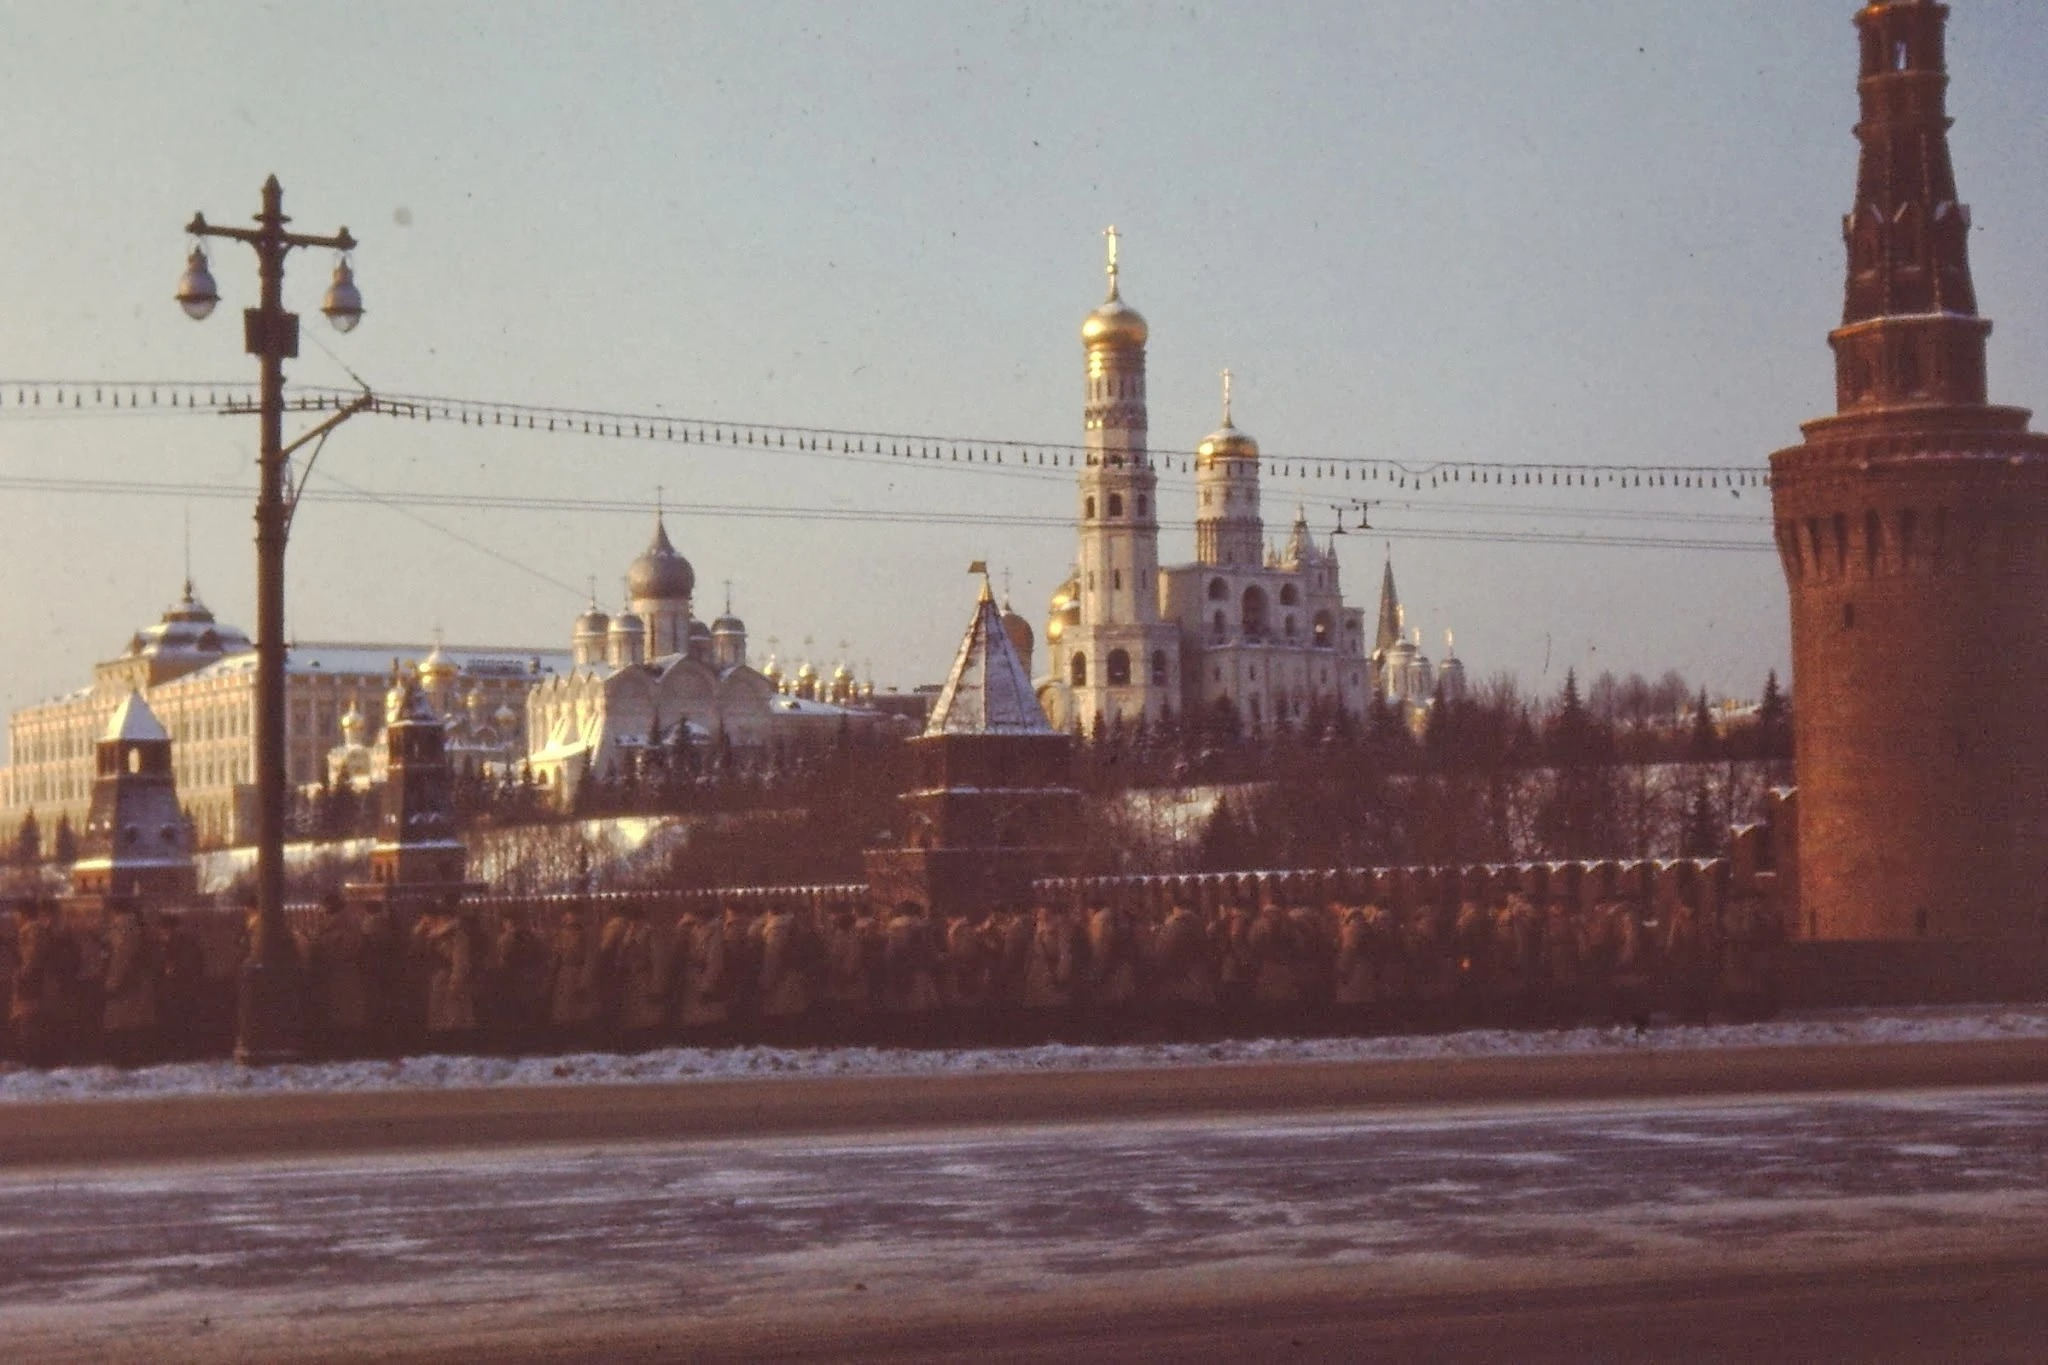 Колонна солдат направляется на мост через Москву